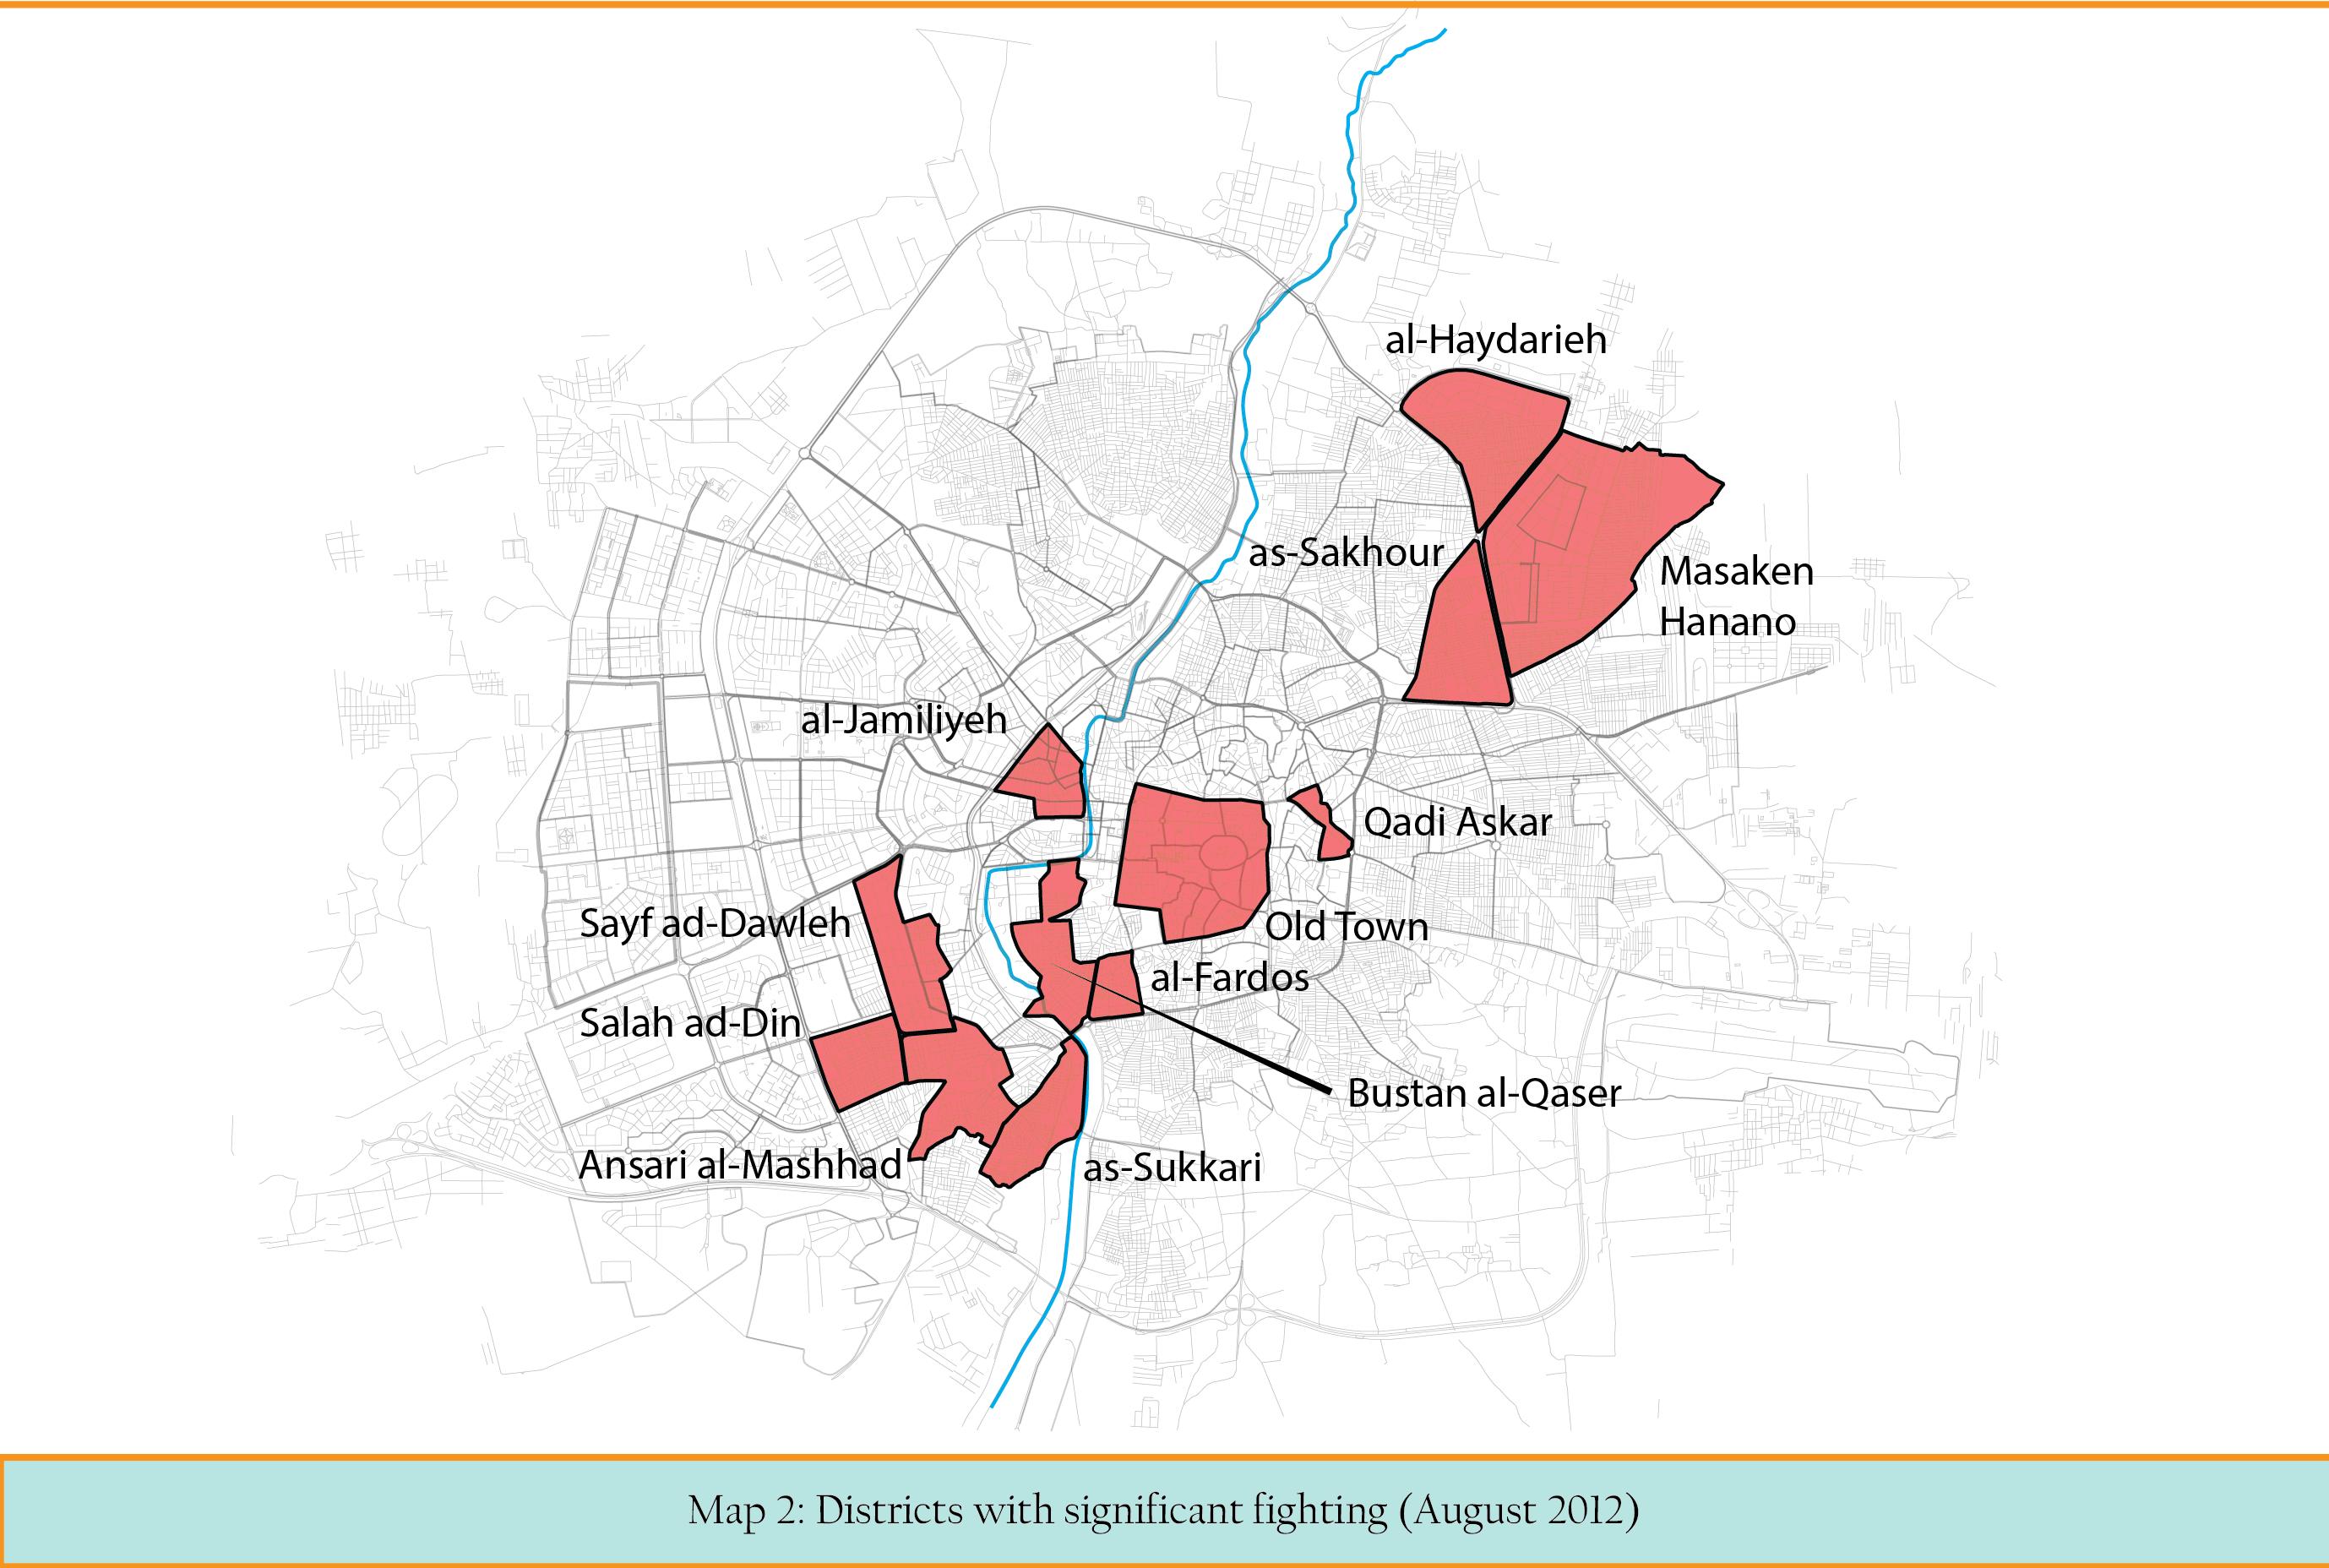 MAP 2 Main clashes in Aleppo